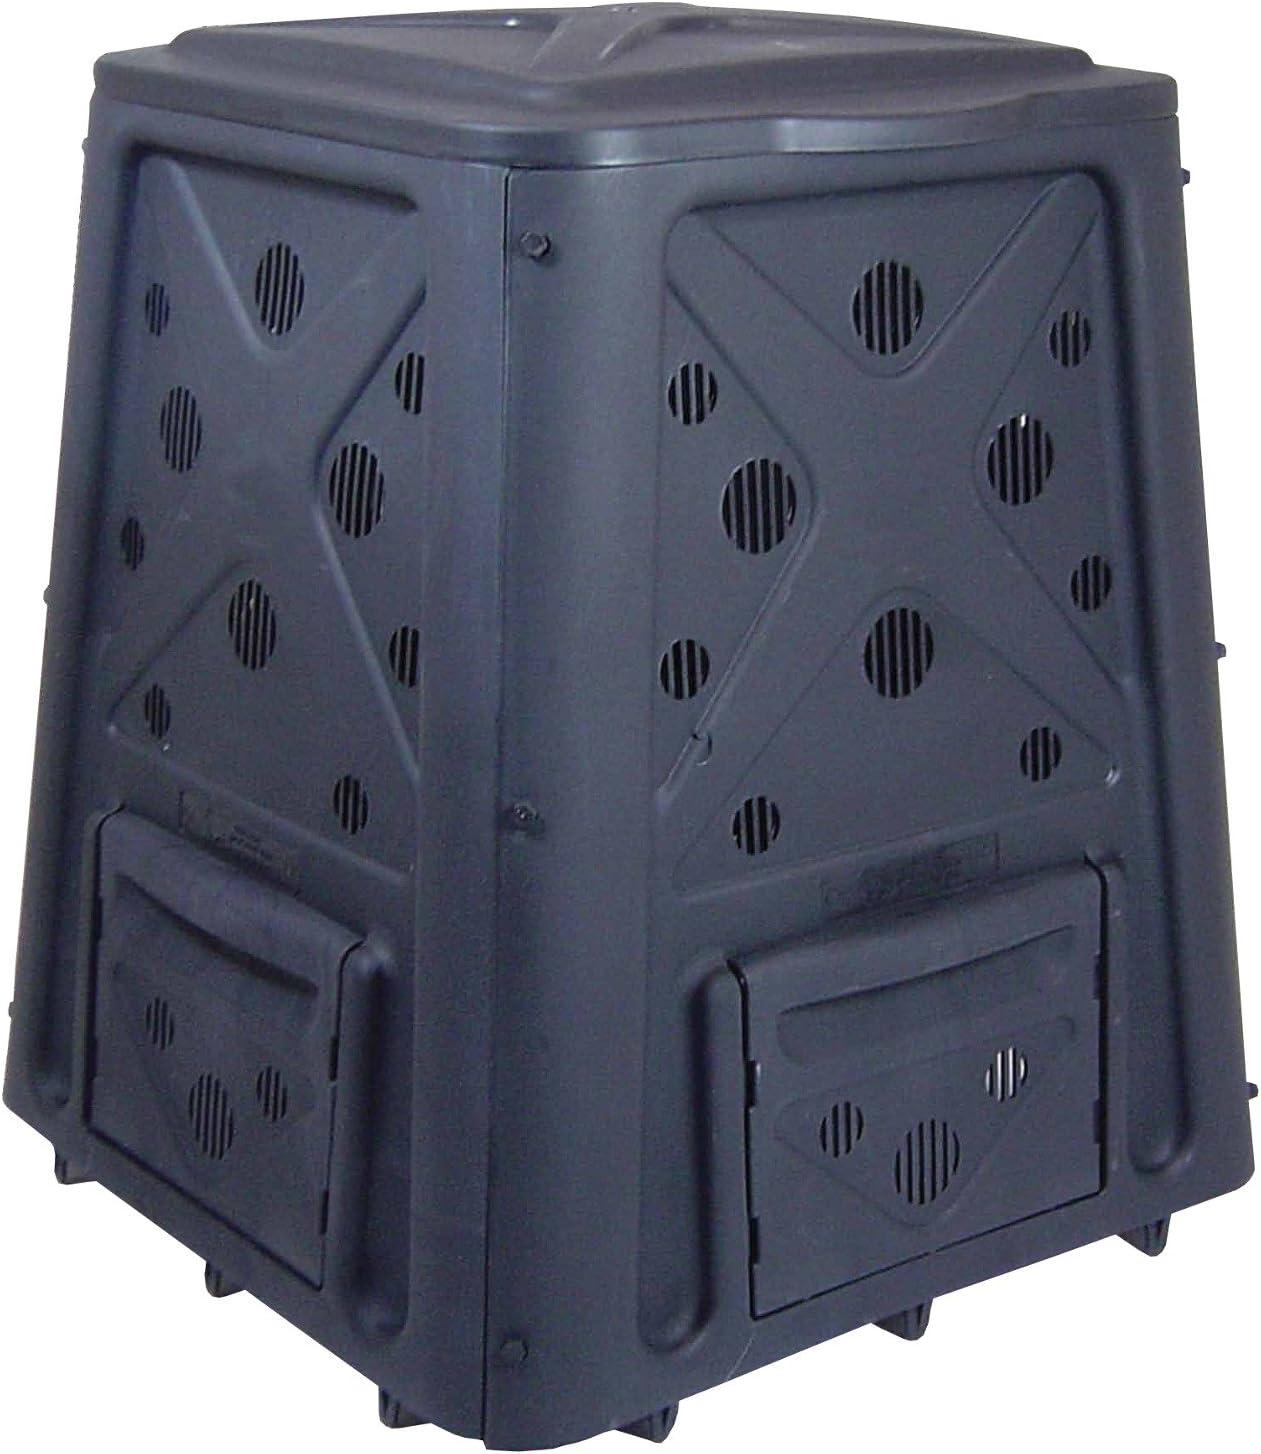 Composter Outdoor Compost Bin